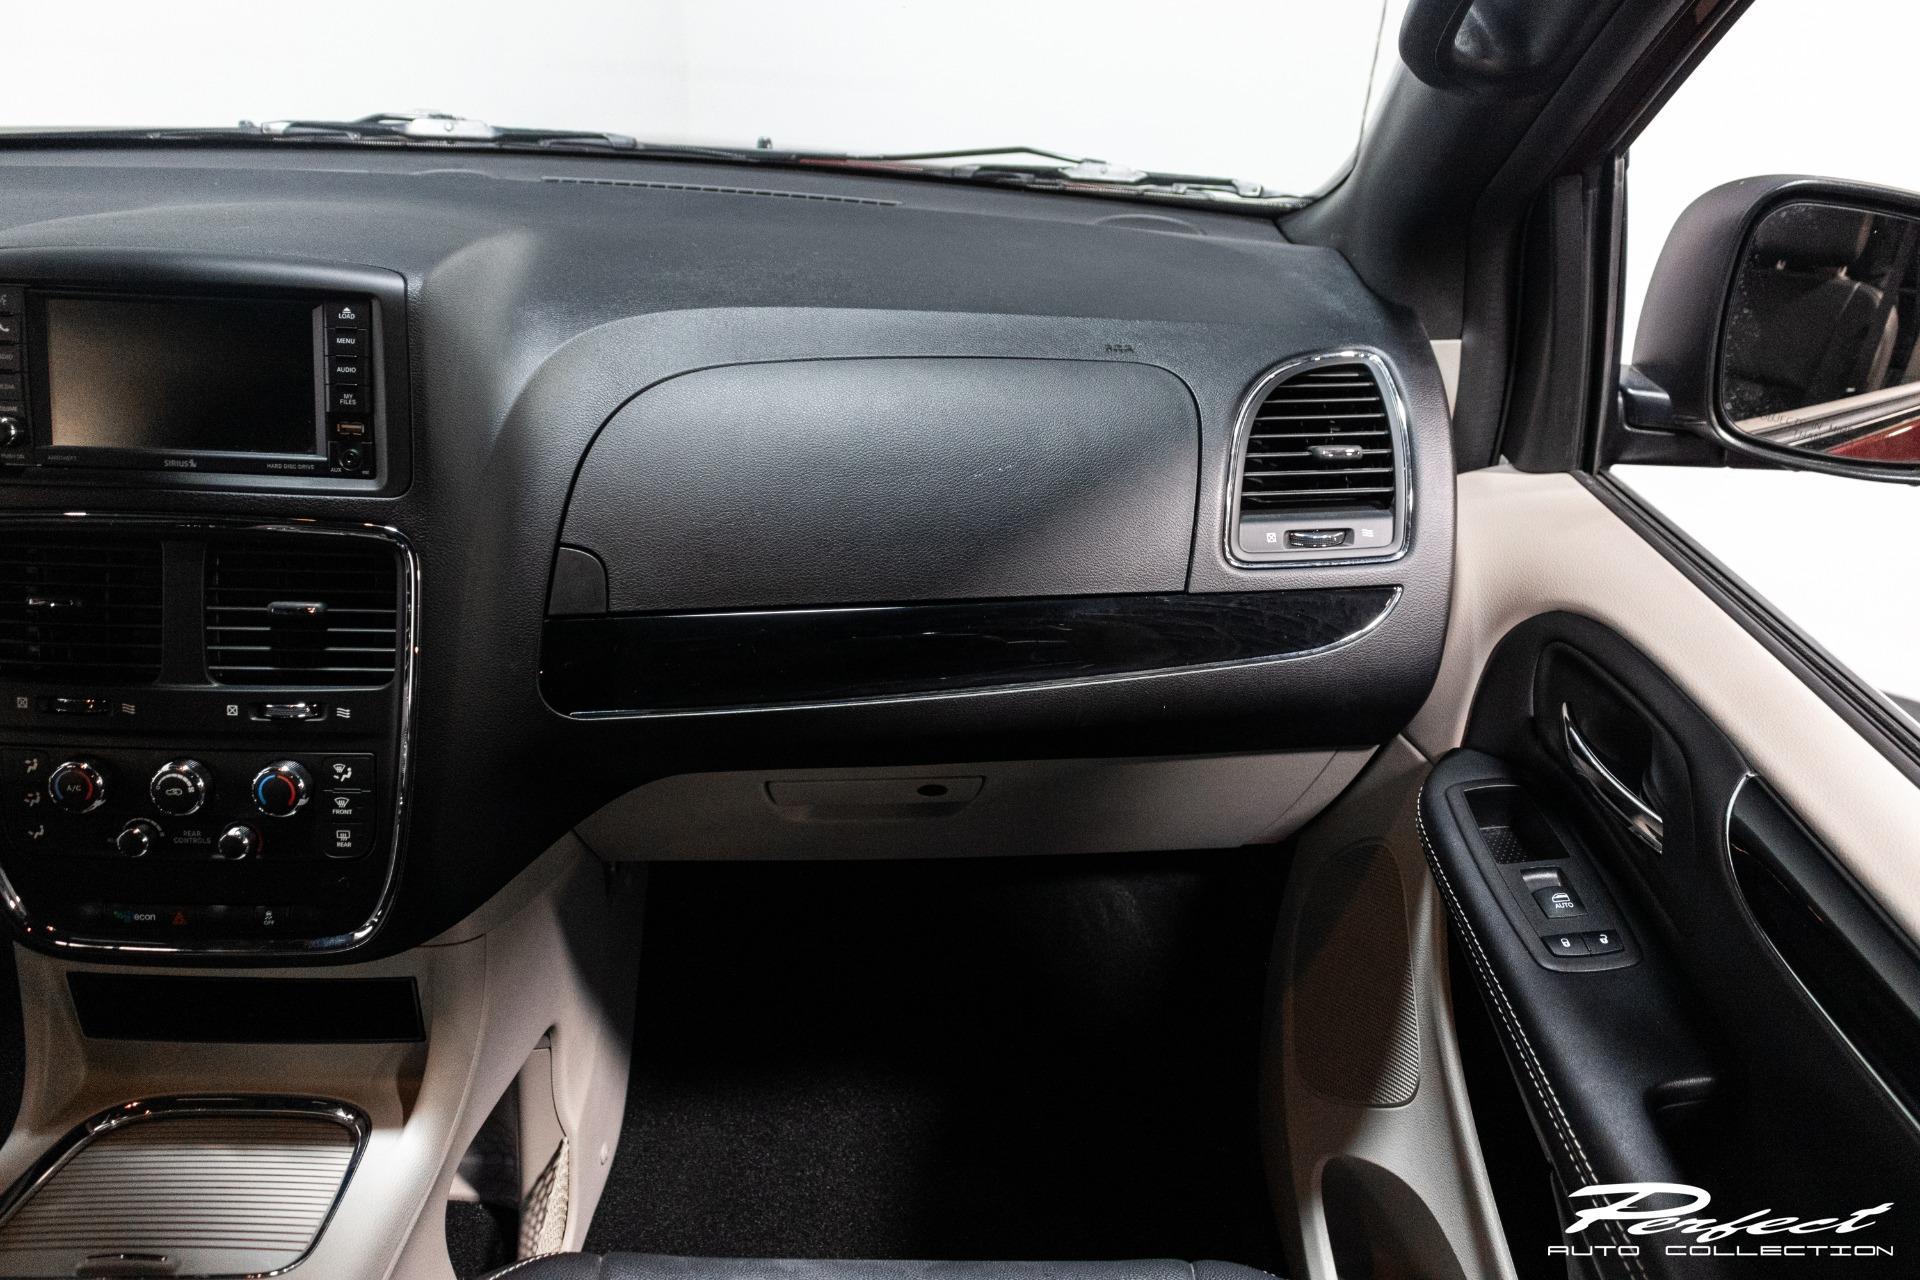 Used 2019 Dodge Grand Caravan Passenger SXT Minivan 4D